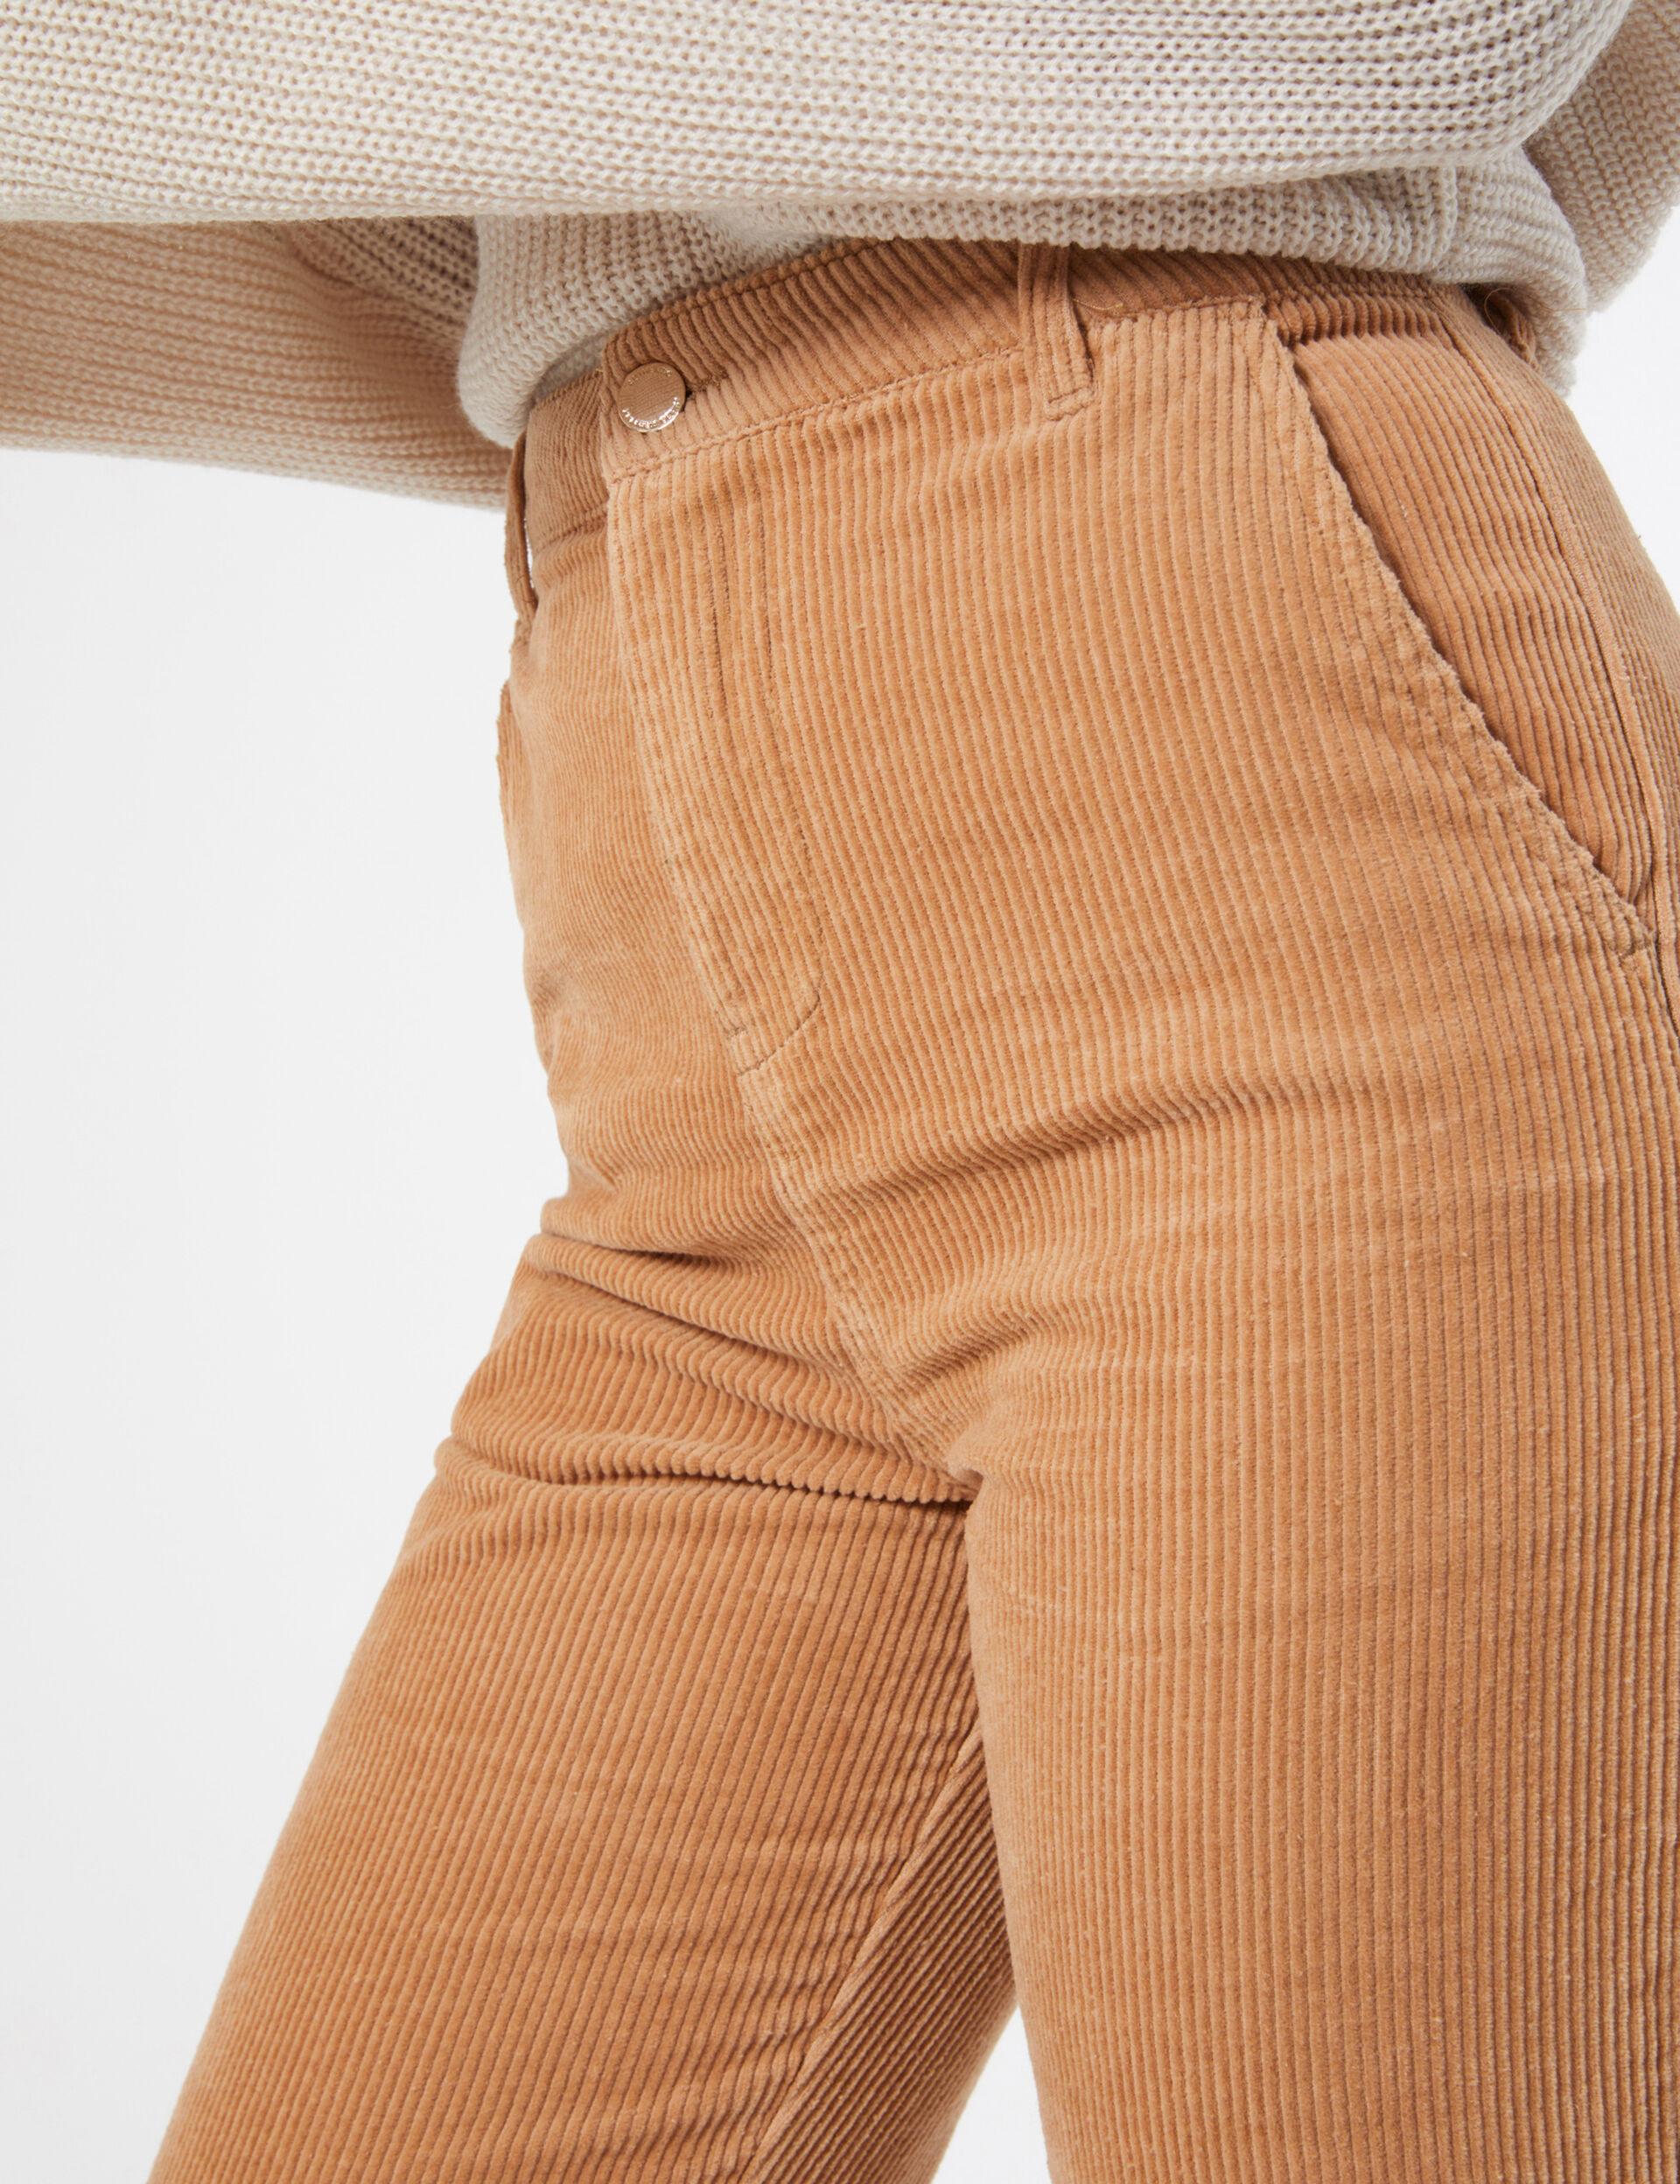 Pantalon carrot cake